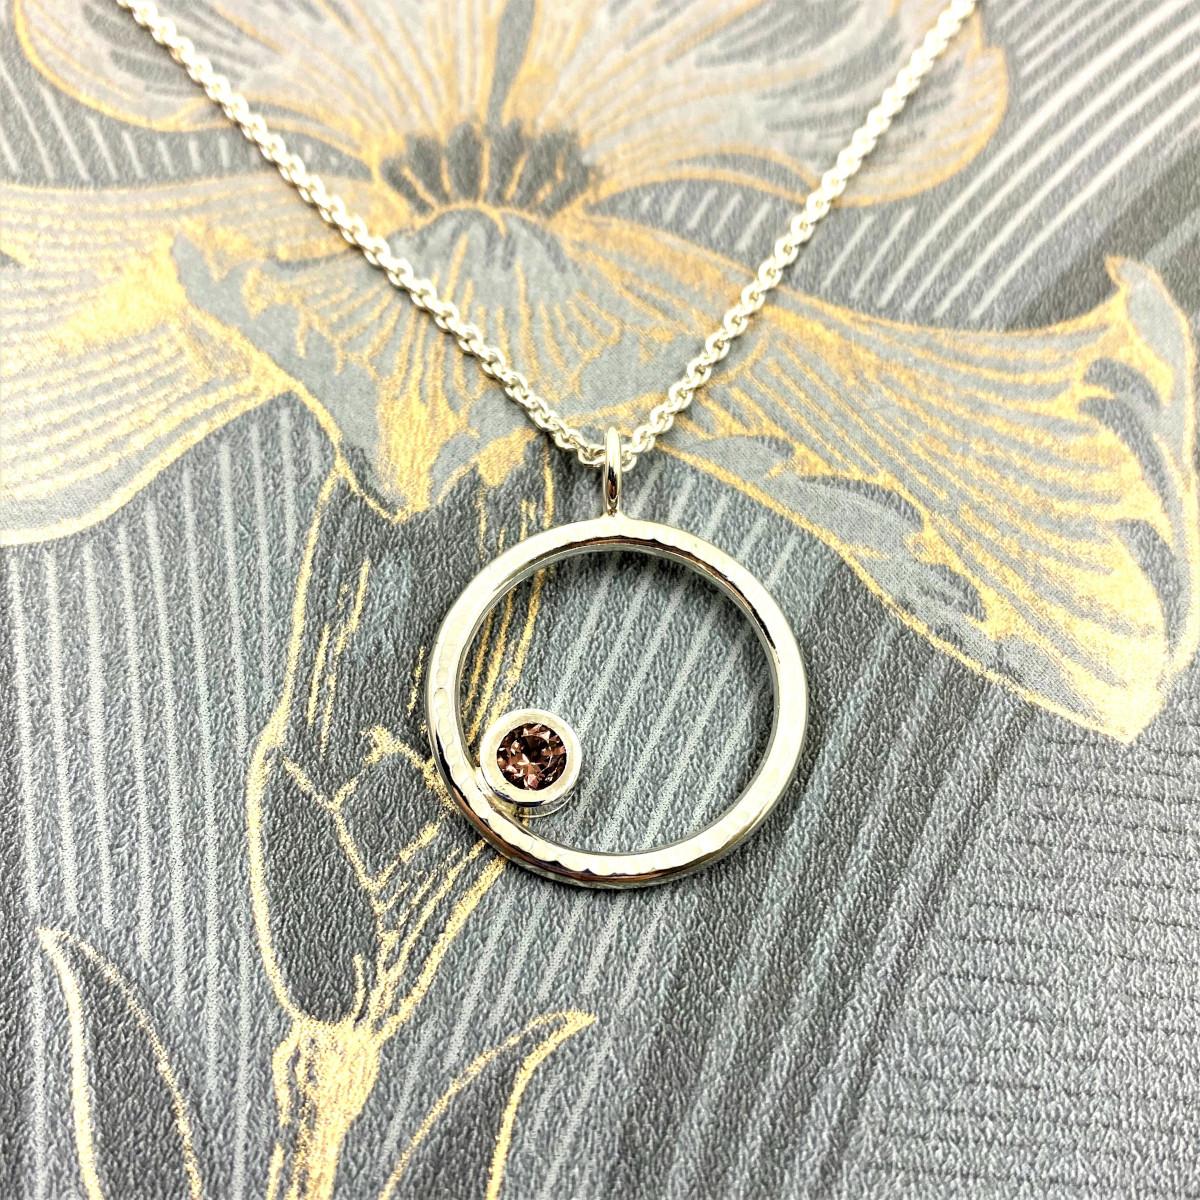 Rosa turmalin, skogens guld, silverhalsband